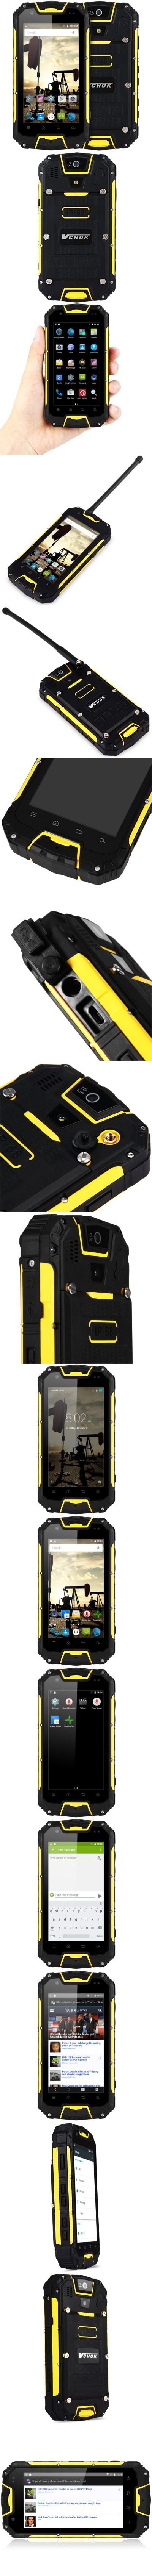 VCHOK M9 IP68 4G Smartphone